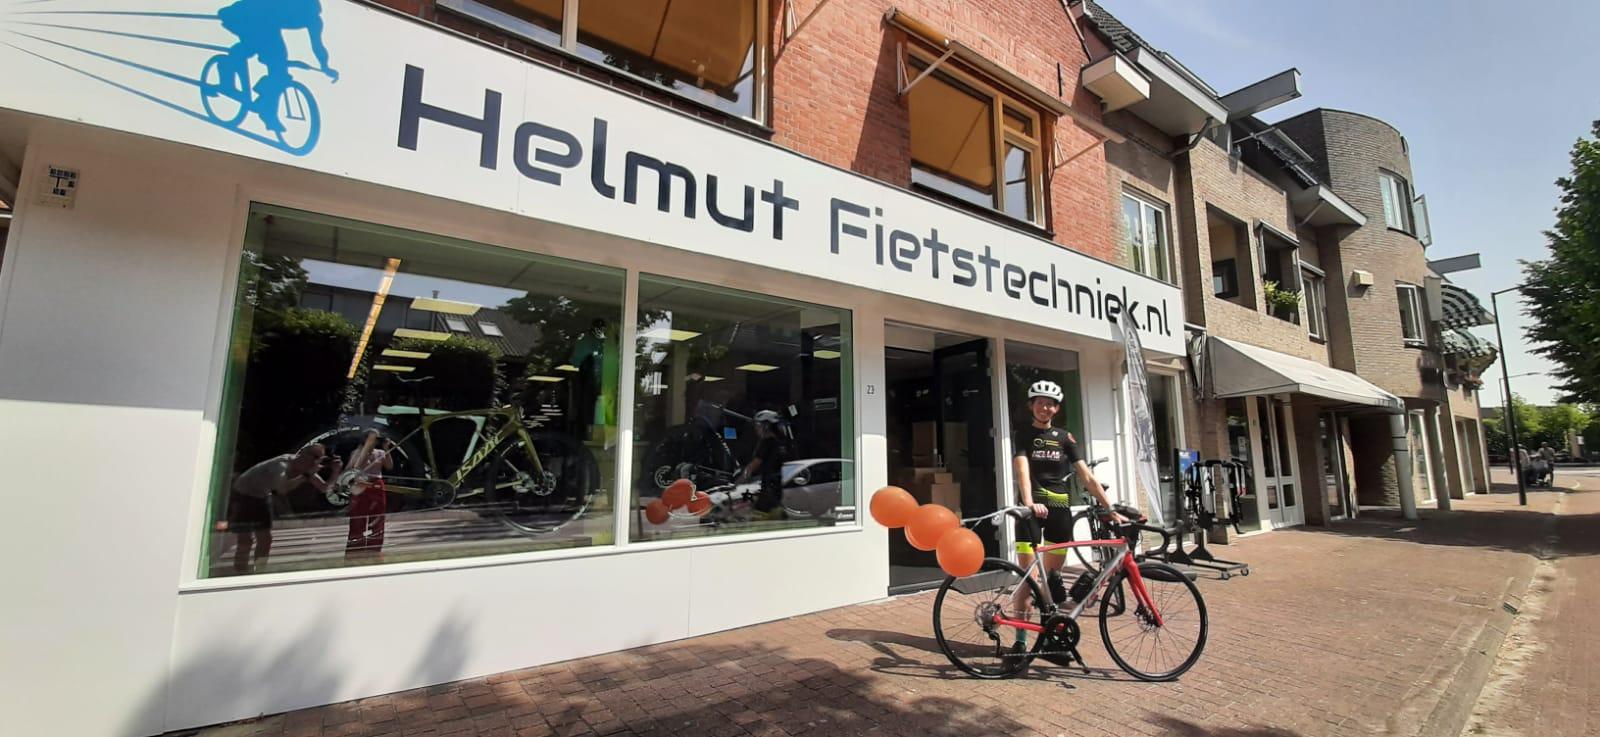 Helmut fietstechniek